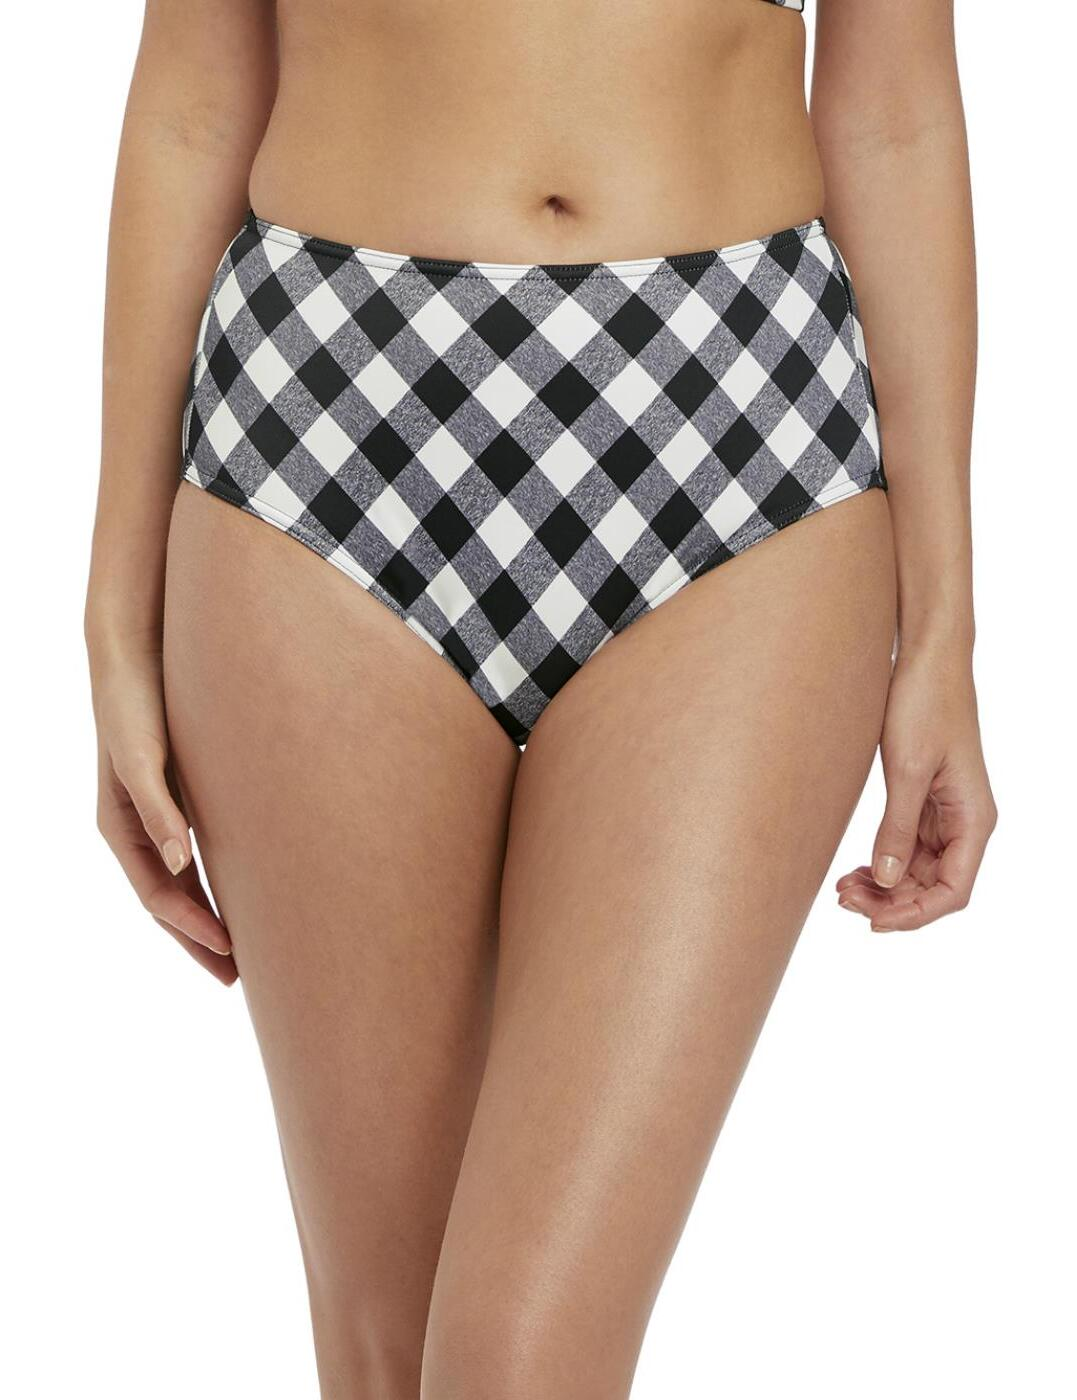 2928 Freya Totally Check High Waist Bikini Brief - 2928 Monochrome